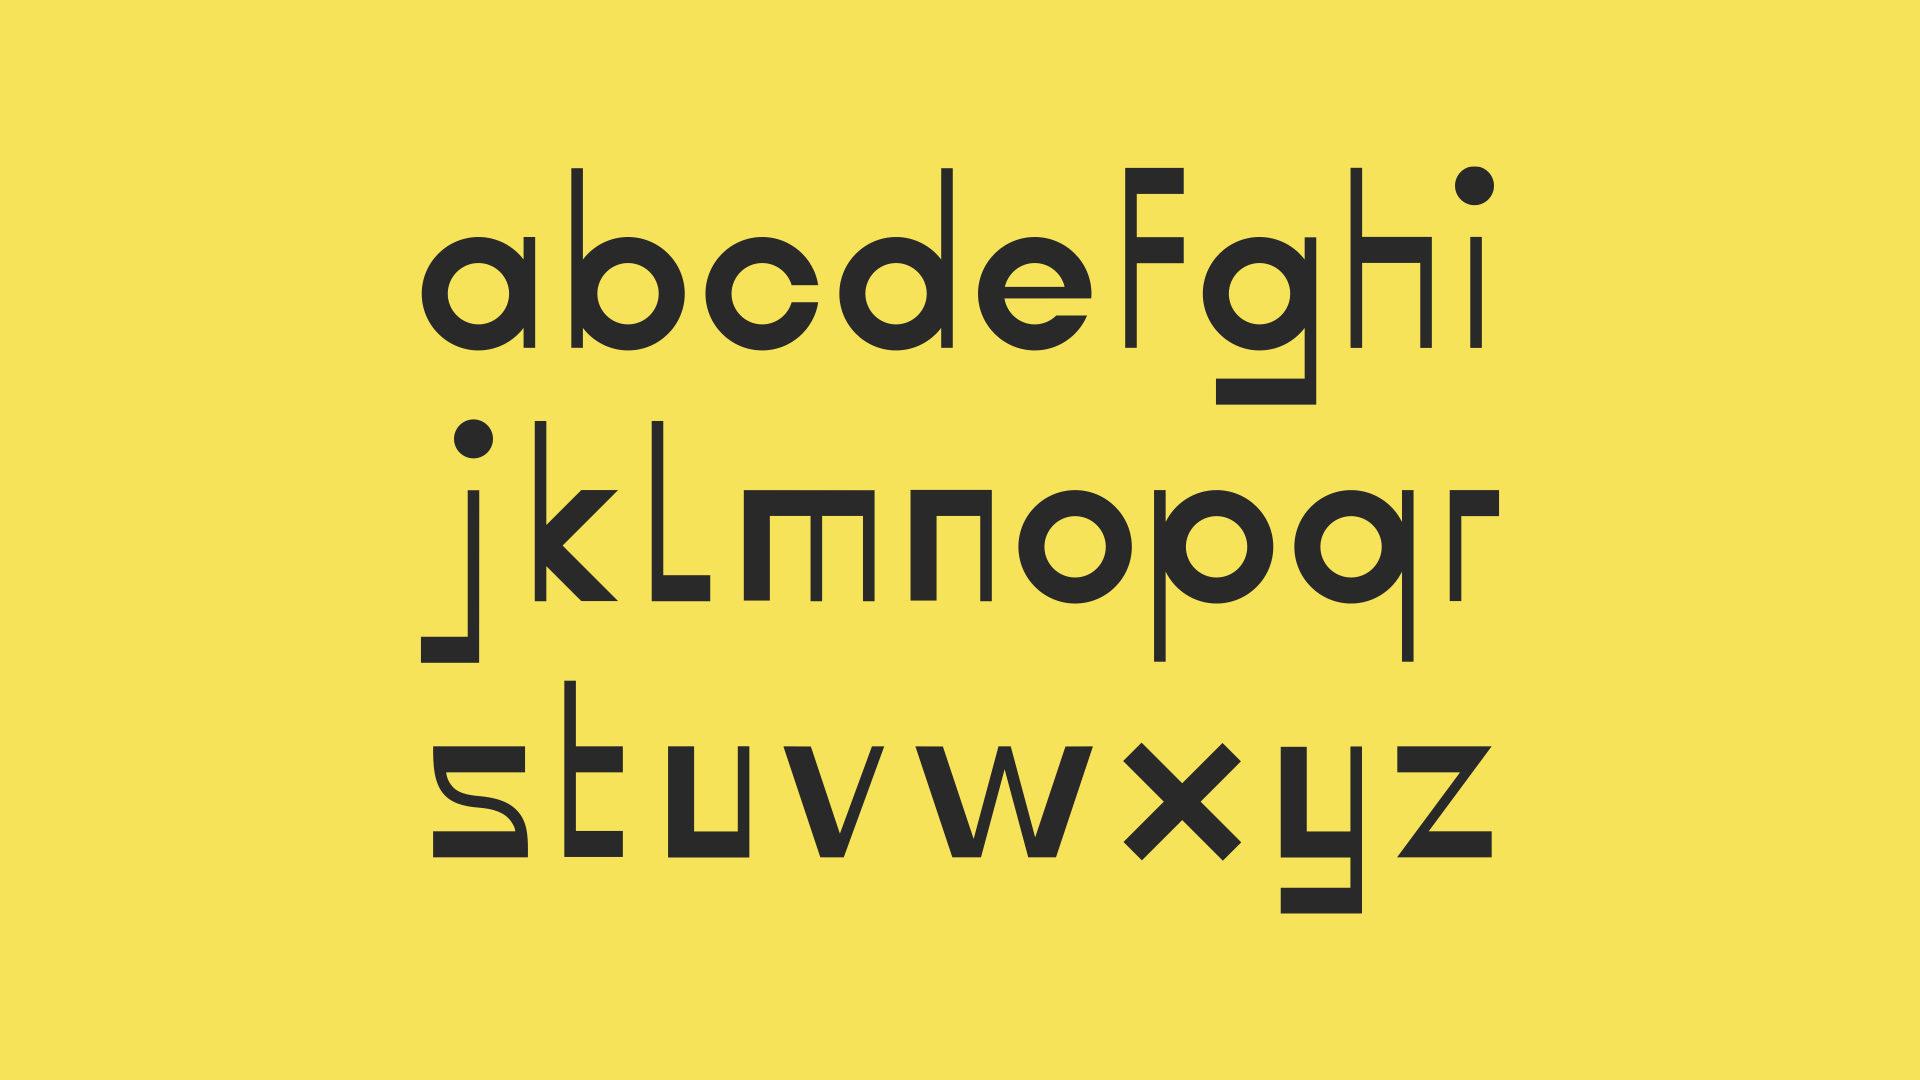 black custom alphabets on yellow background